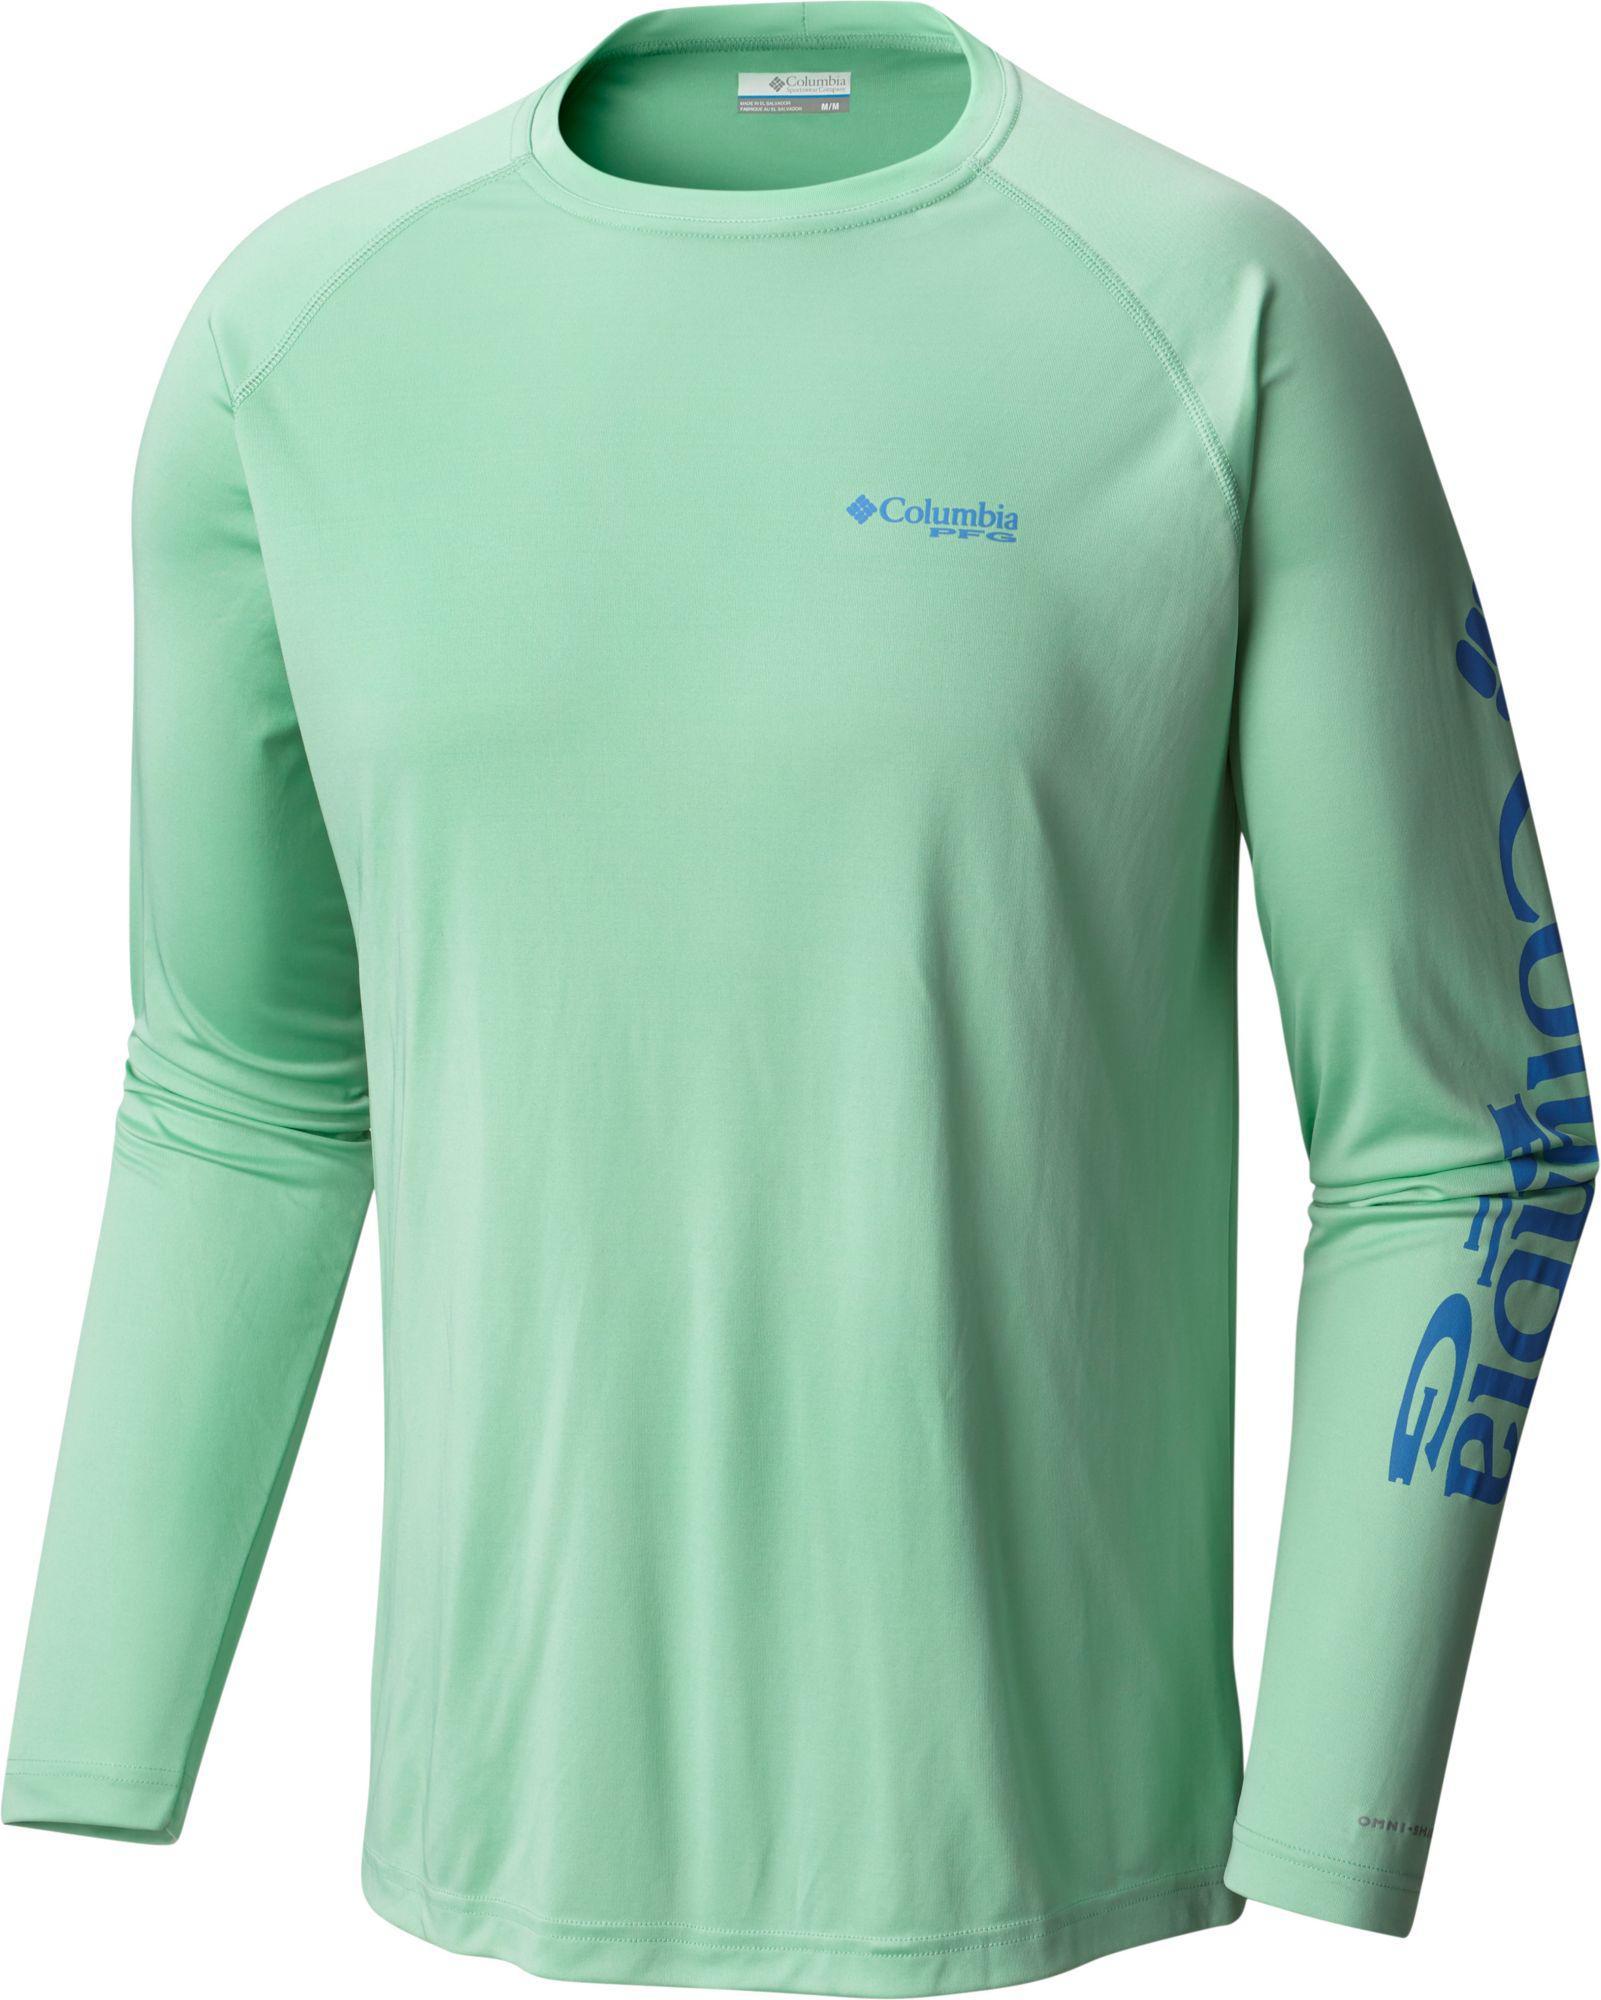 cdfd345ed89 Columbia - Green Pfg Terminal Tackle Long Sleeve Shirt for Men - Lyst. View  fullscreen